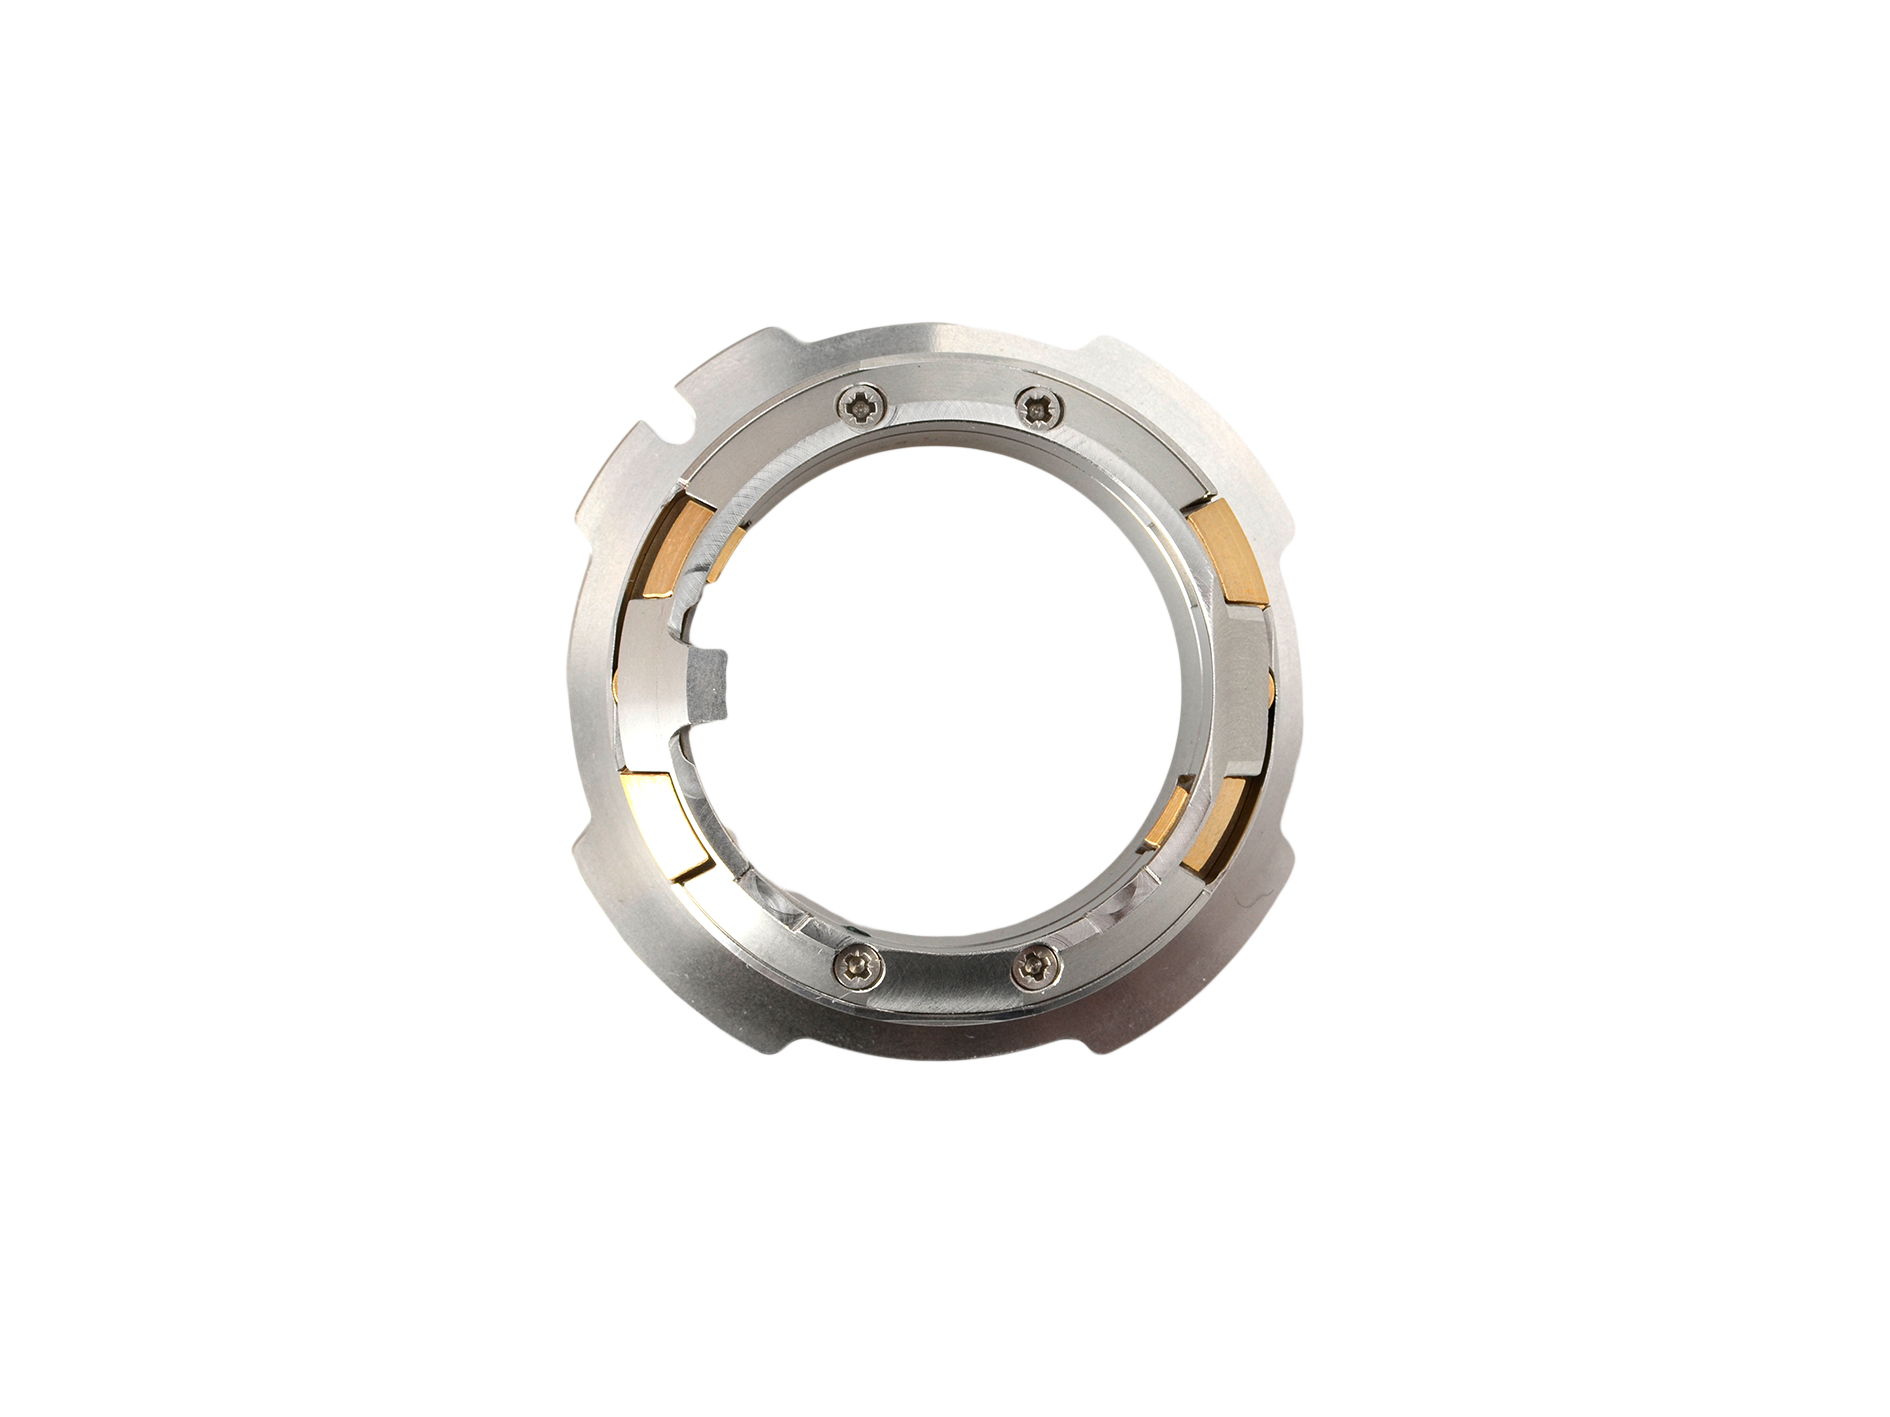 extenders lens adaptors true lens services repair service and